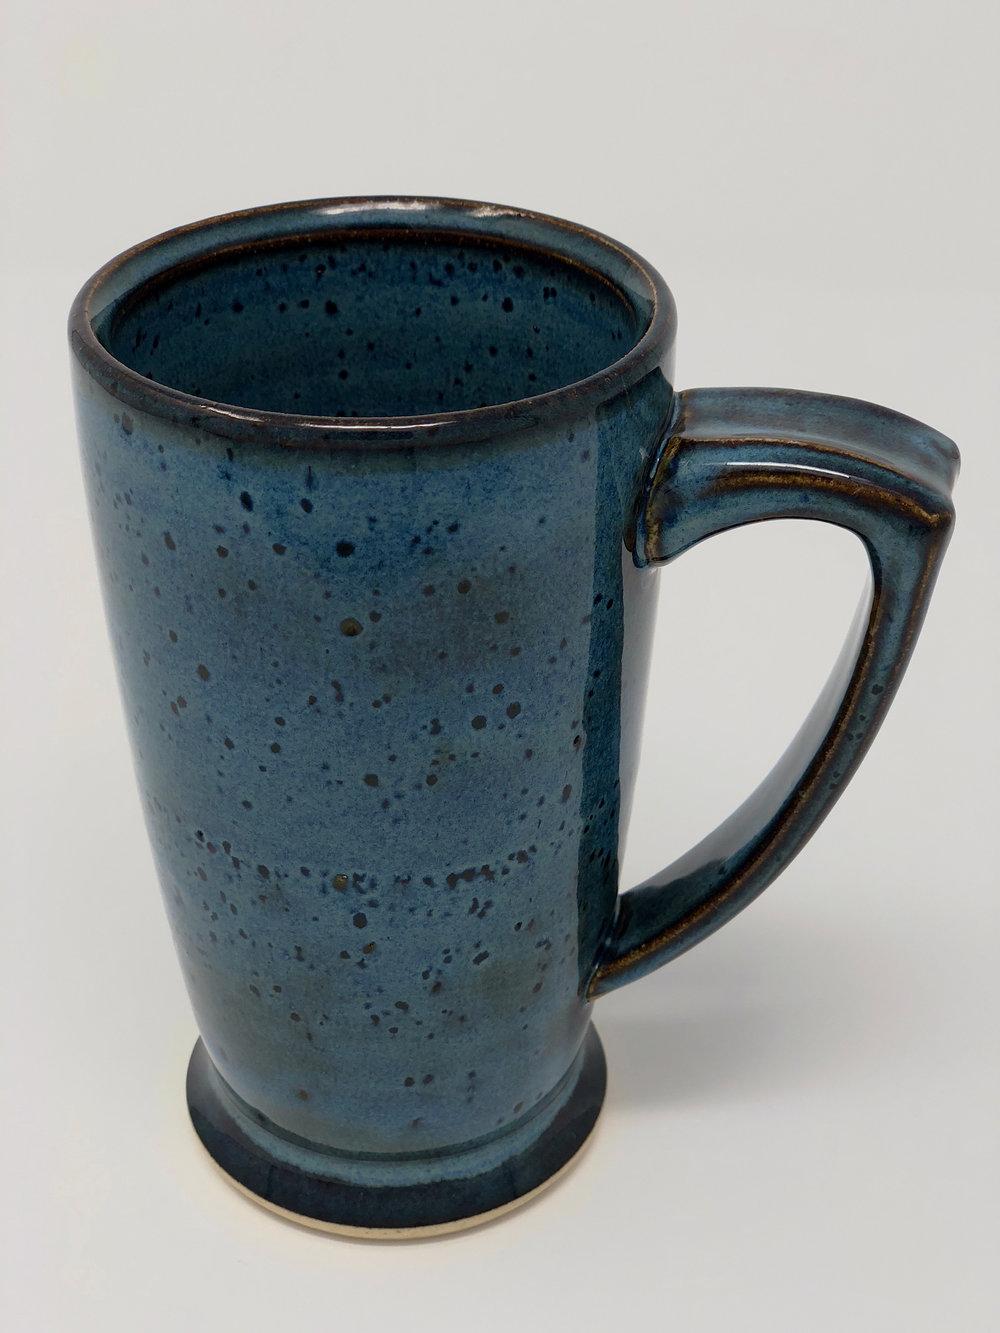 Chris Brodigan Stoneware Mug 300dpi.jpg